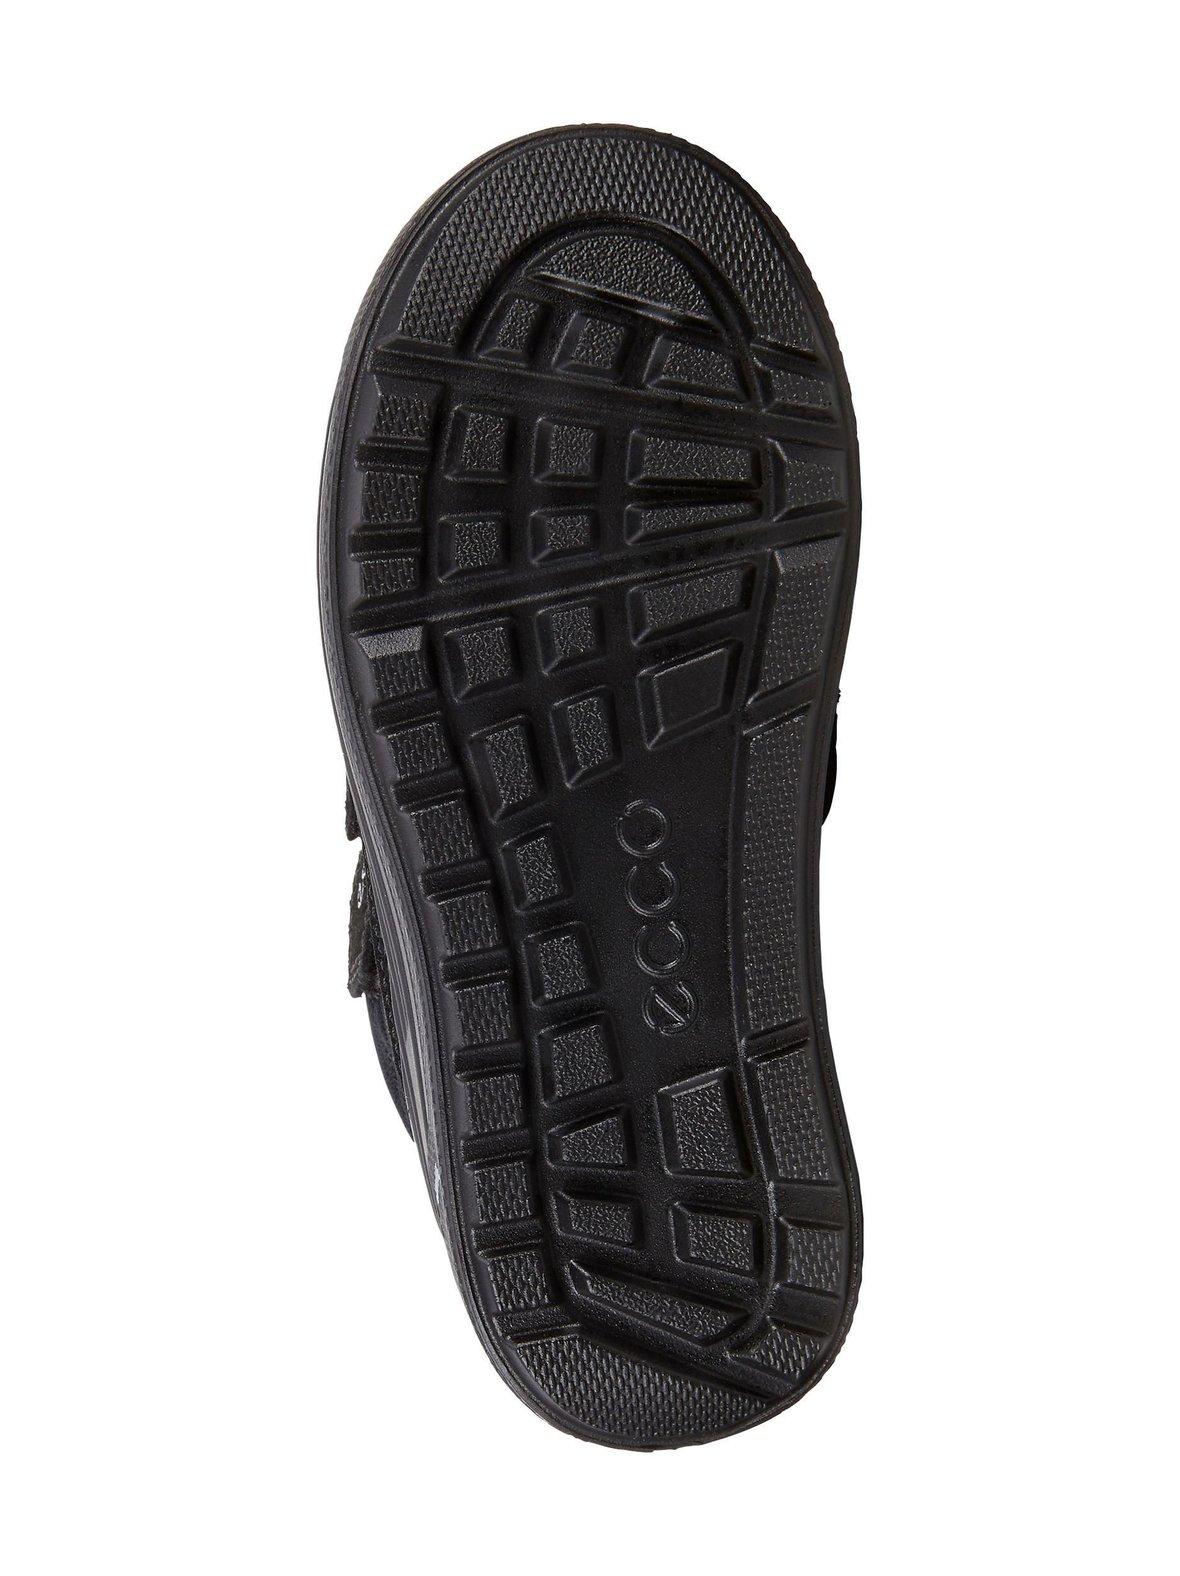 Black (musta) ecco Urban Snowboarder GTX -kengät 722292 722293  d3aa9d1ee1